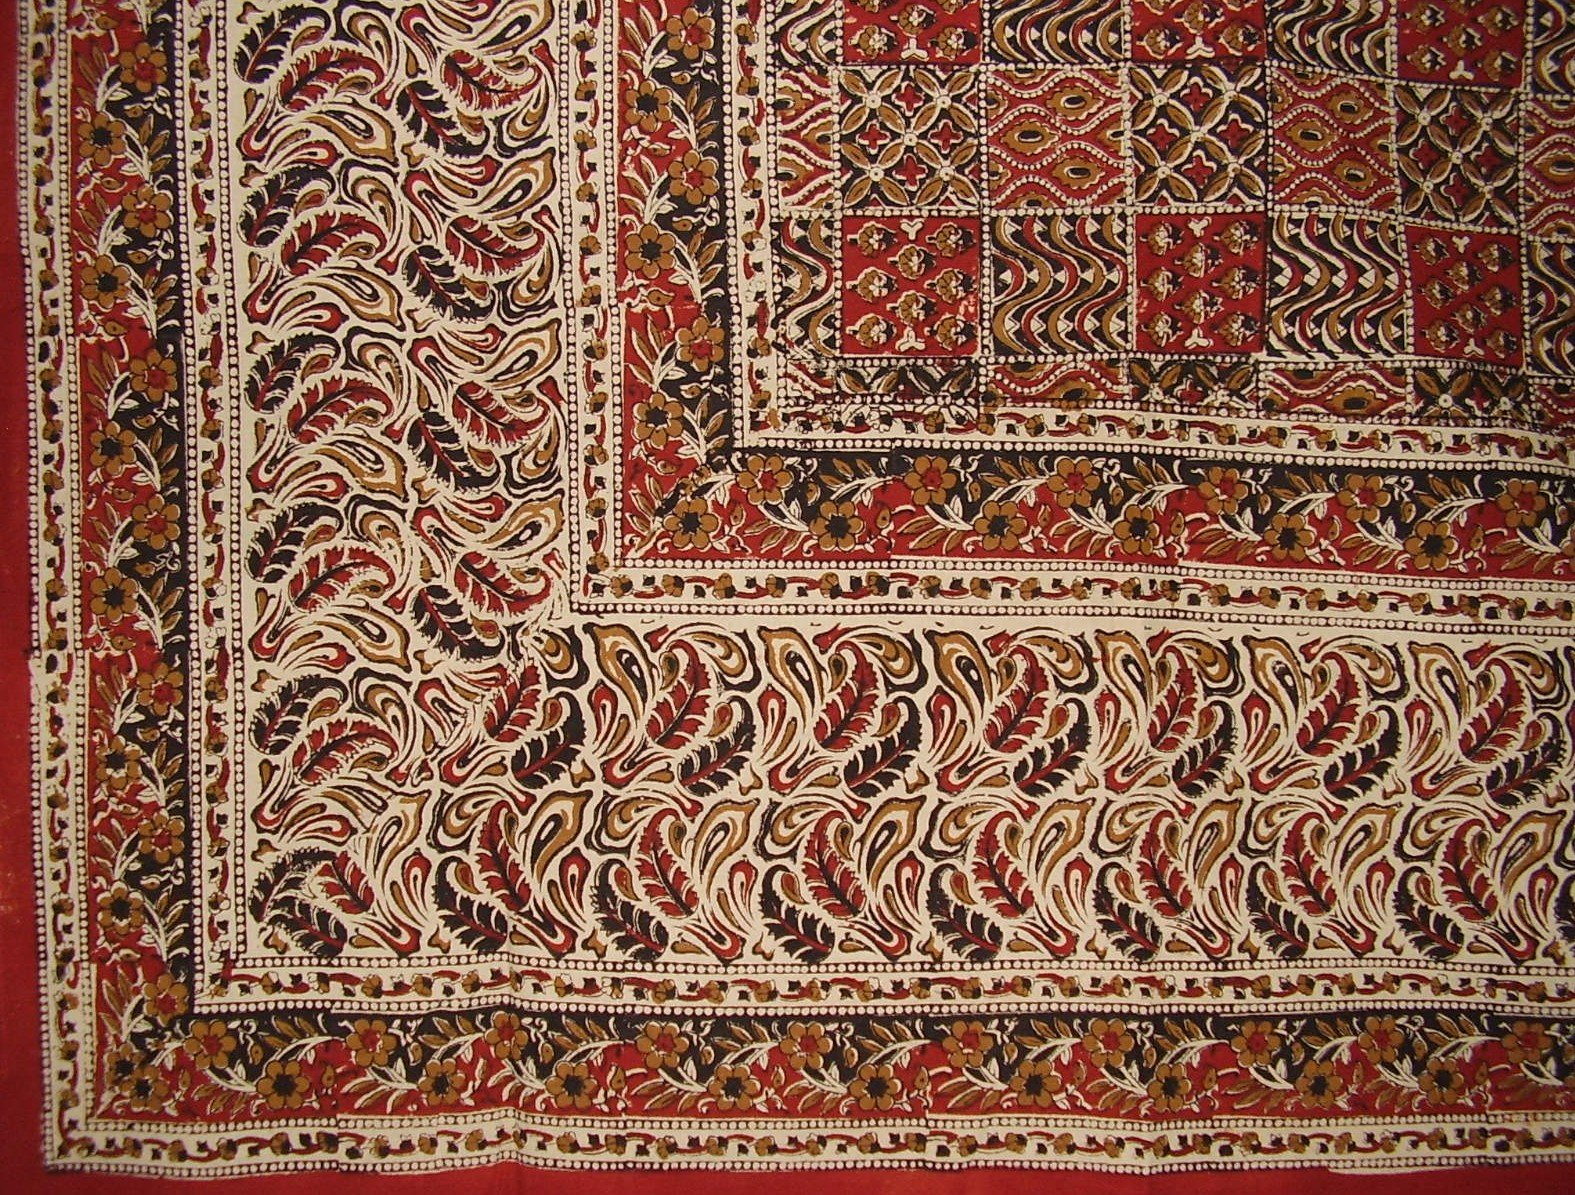 Kalamkari Block Print Tapestry Cotton Bedspread 108'' x 88'' Full-Queen Multi Color